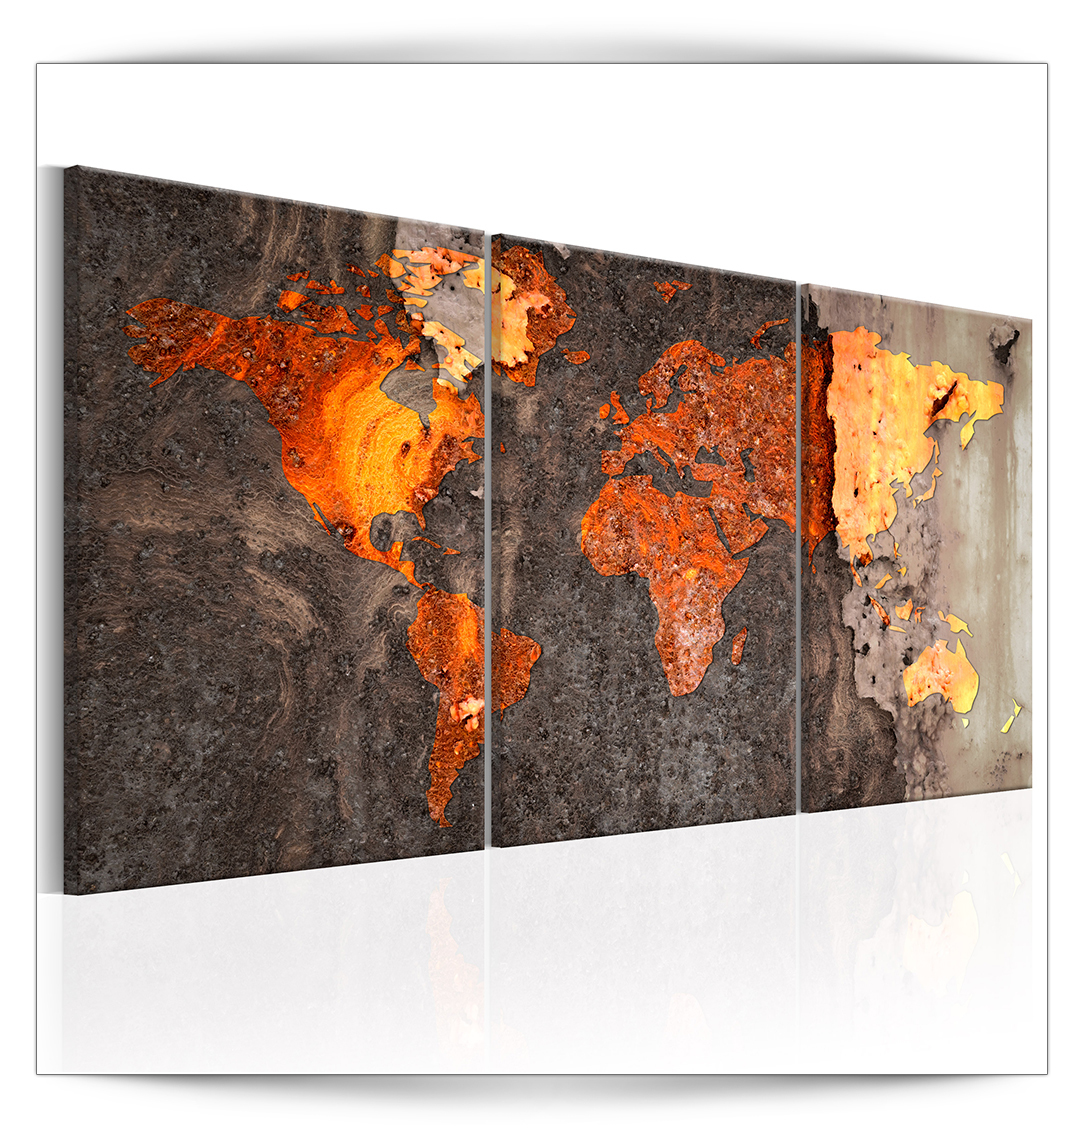 bilder leinwand bild weltkarte stahl kupfer rost abstrakt wandbilder kunstdruck ebay. Black Bedroom Furniture Sets. Home Design Ideas